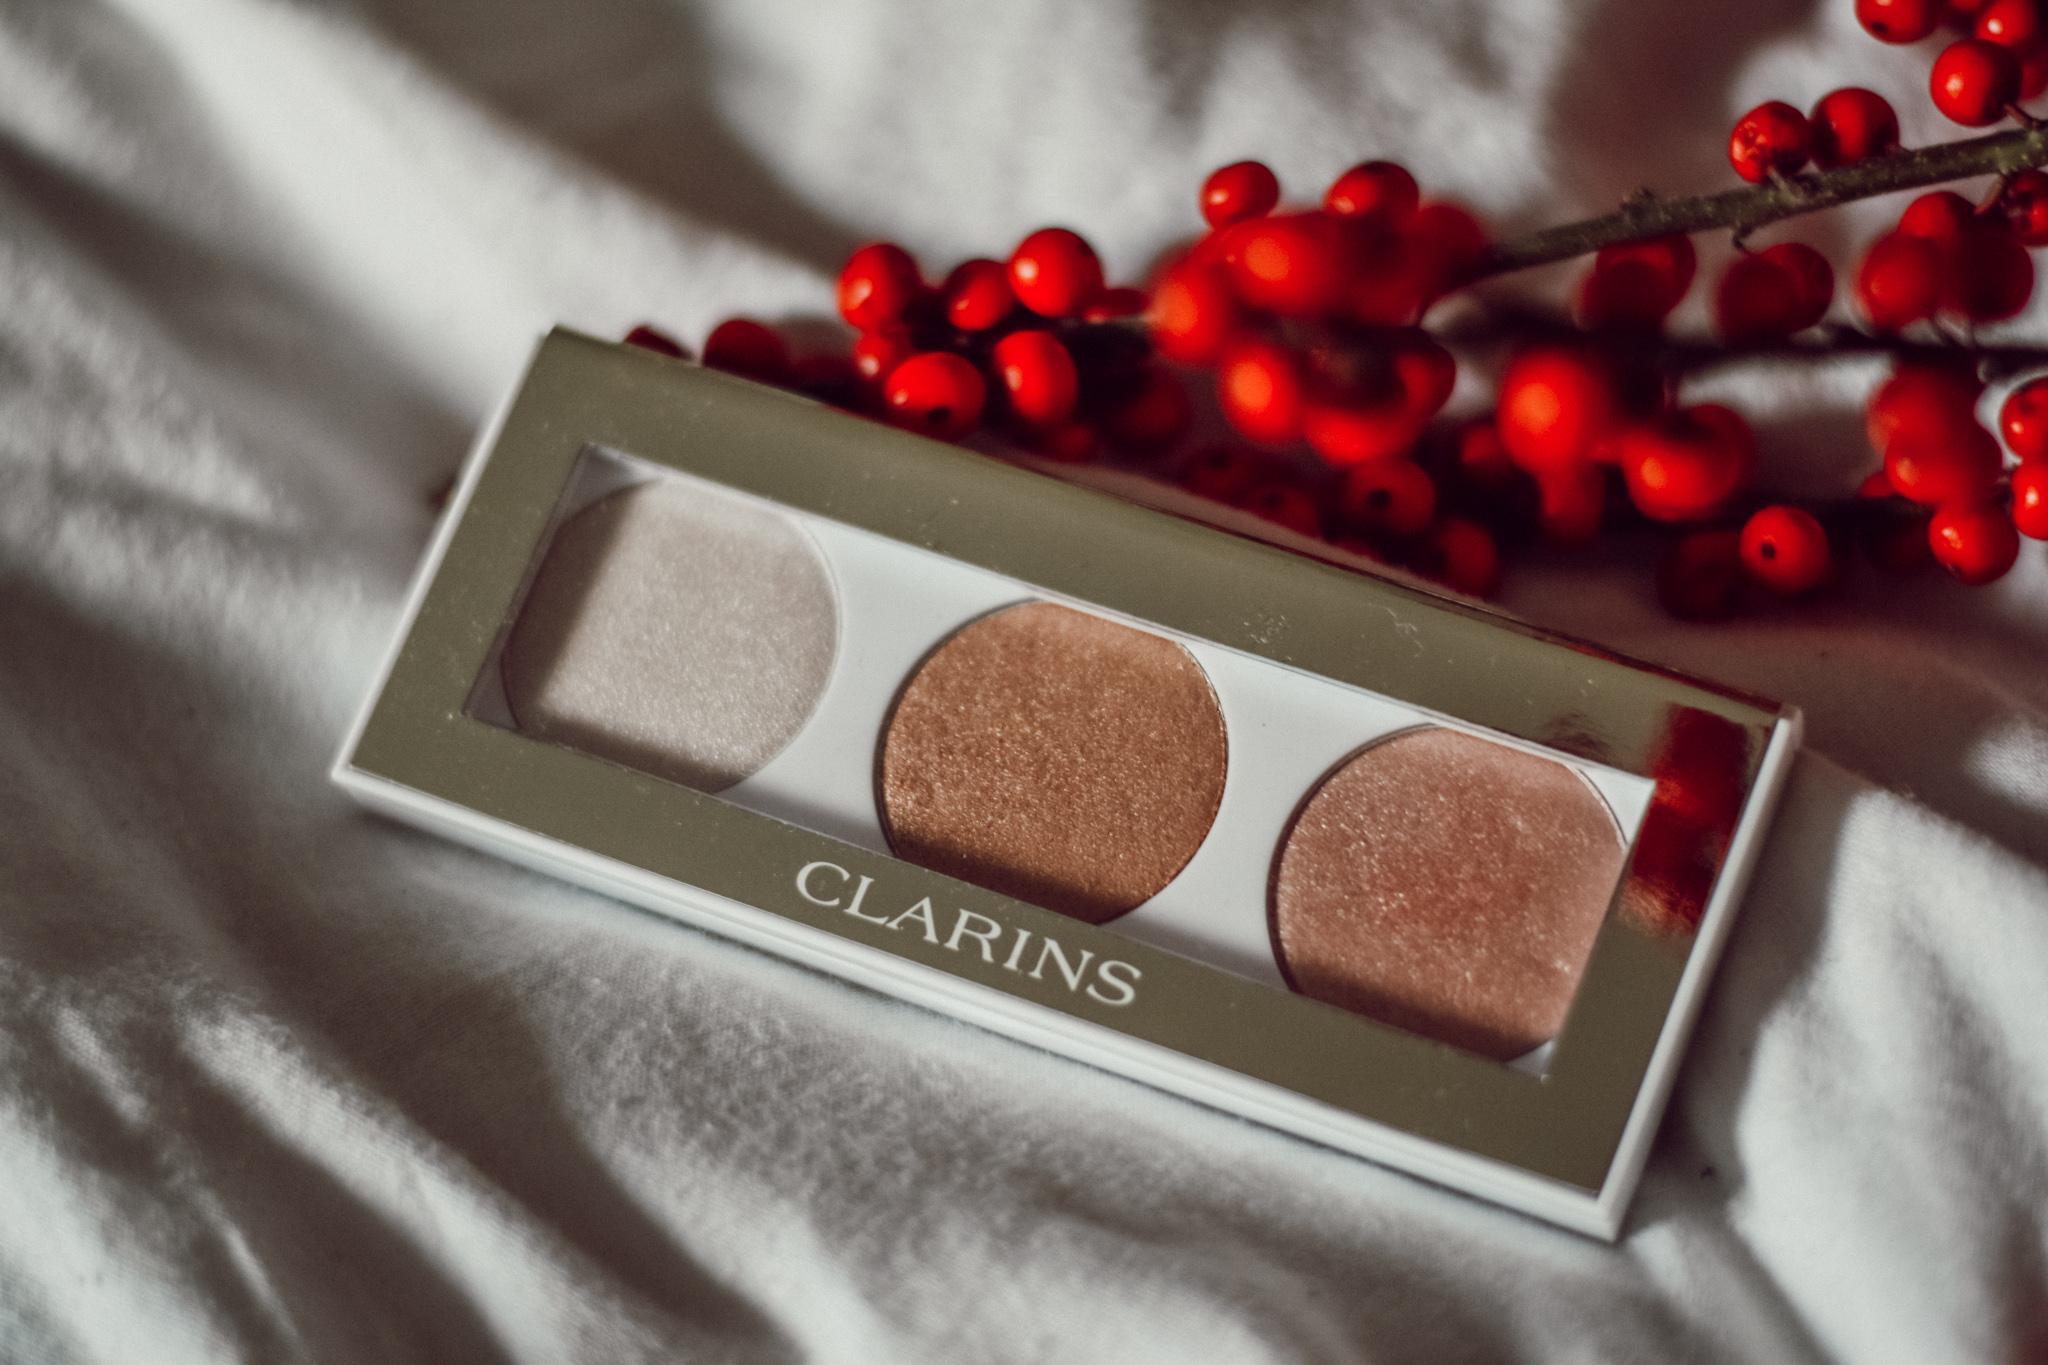 Clarins - Highlighter Trio